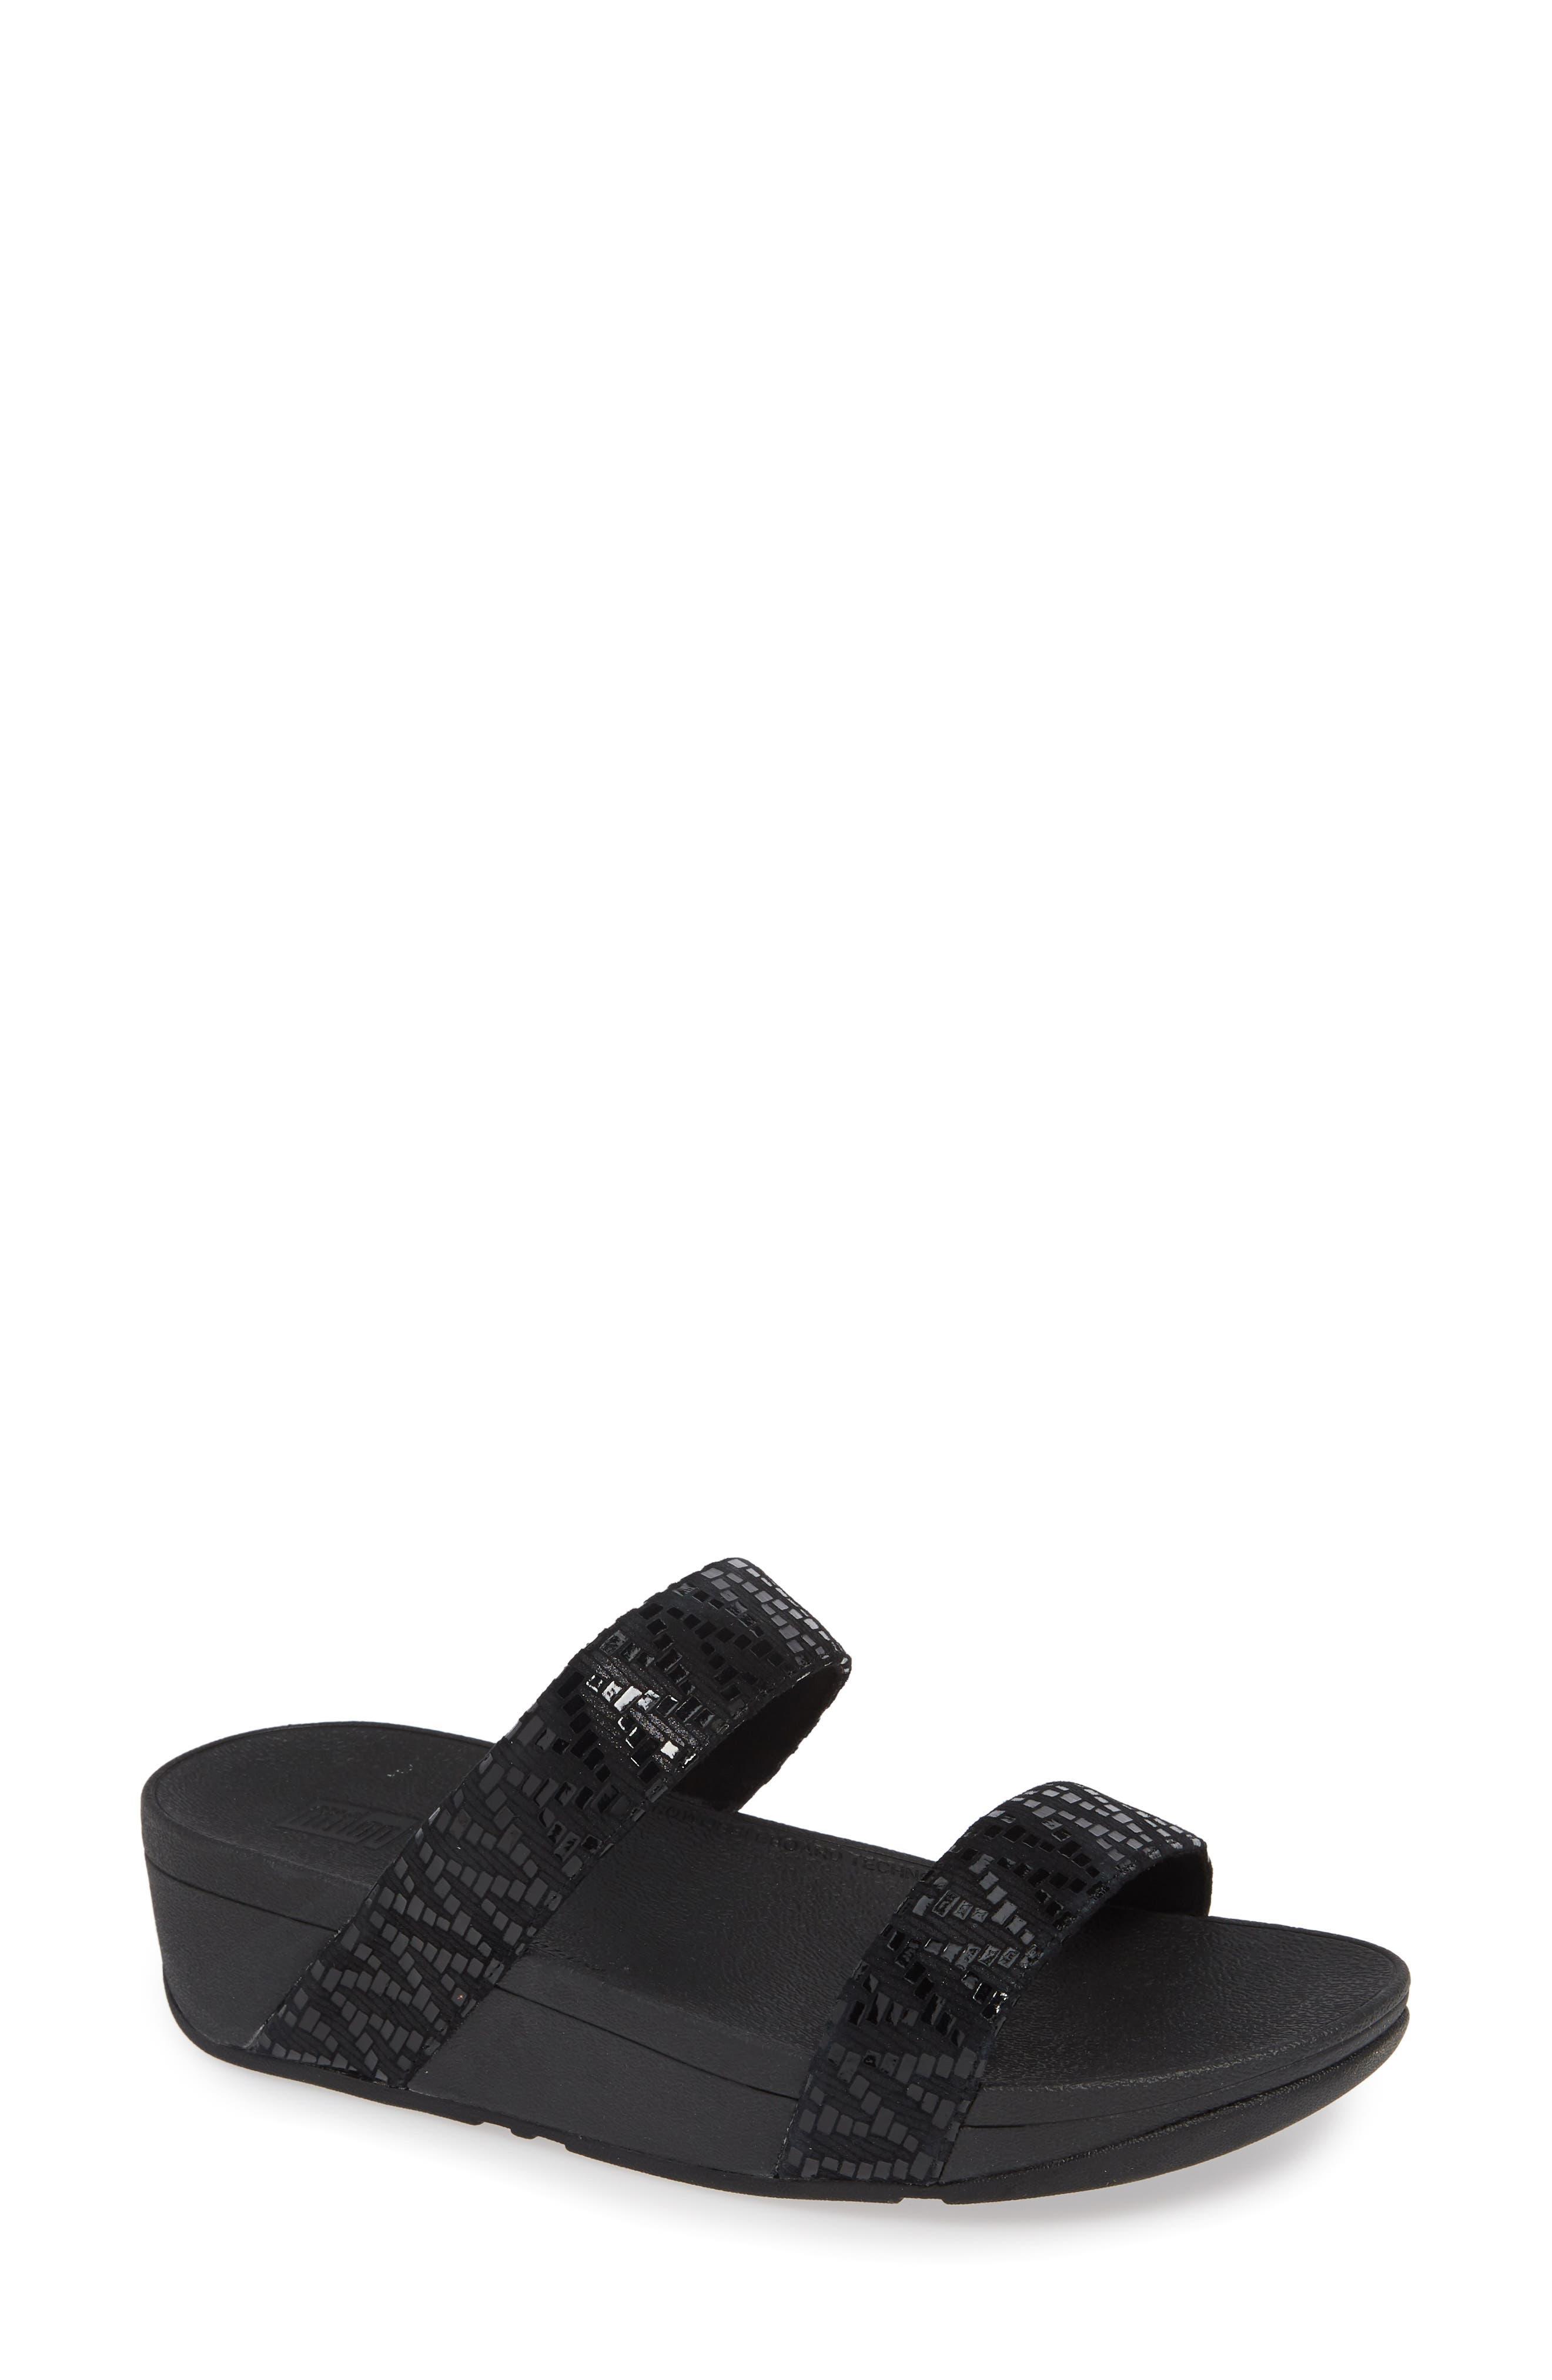 FITFLOP, Lottie Chevron Wedge Slide Sandal, Main thumbnail 1, color, BLACK FABRIC